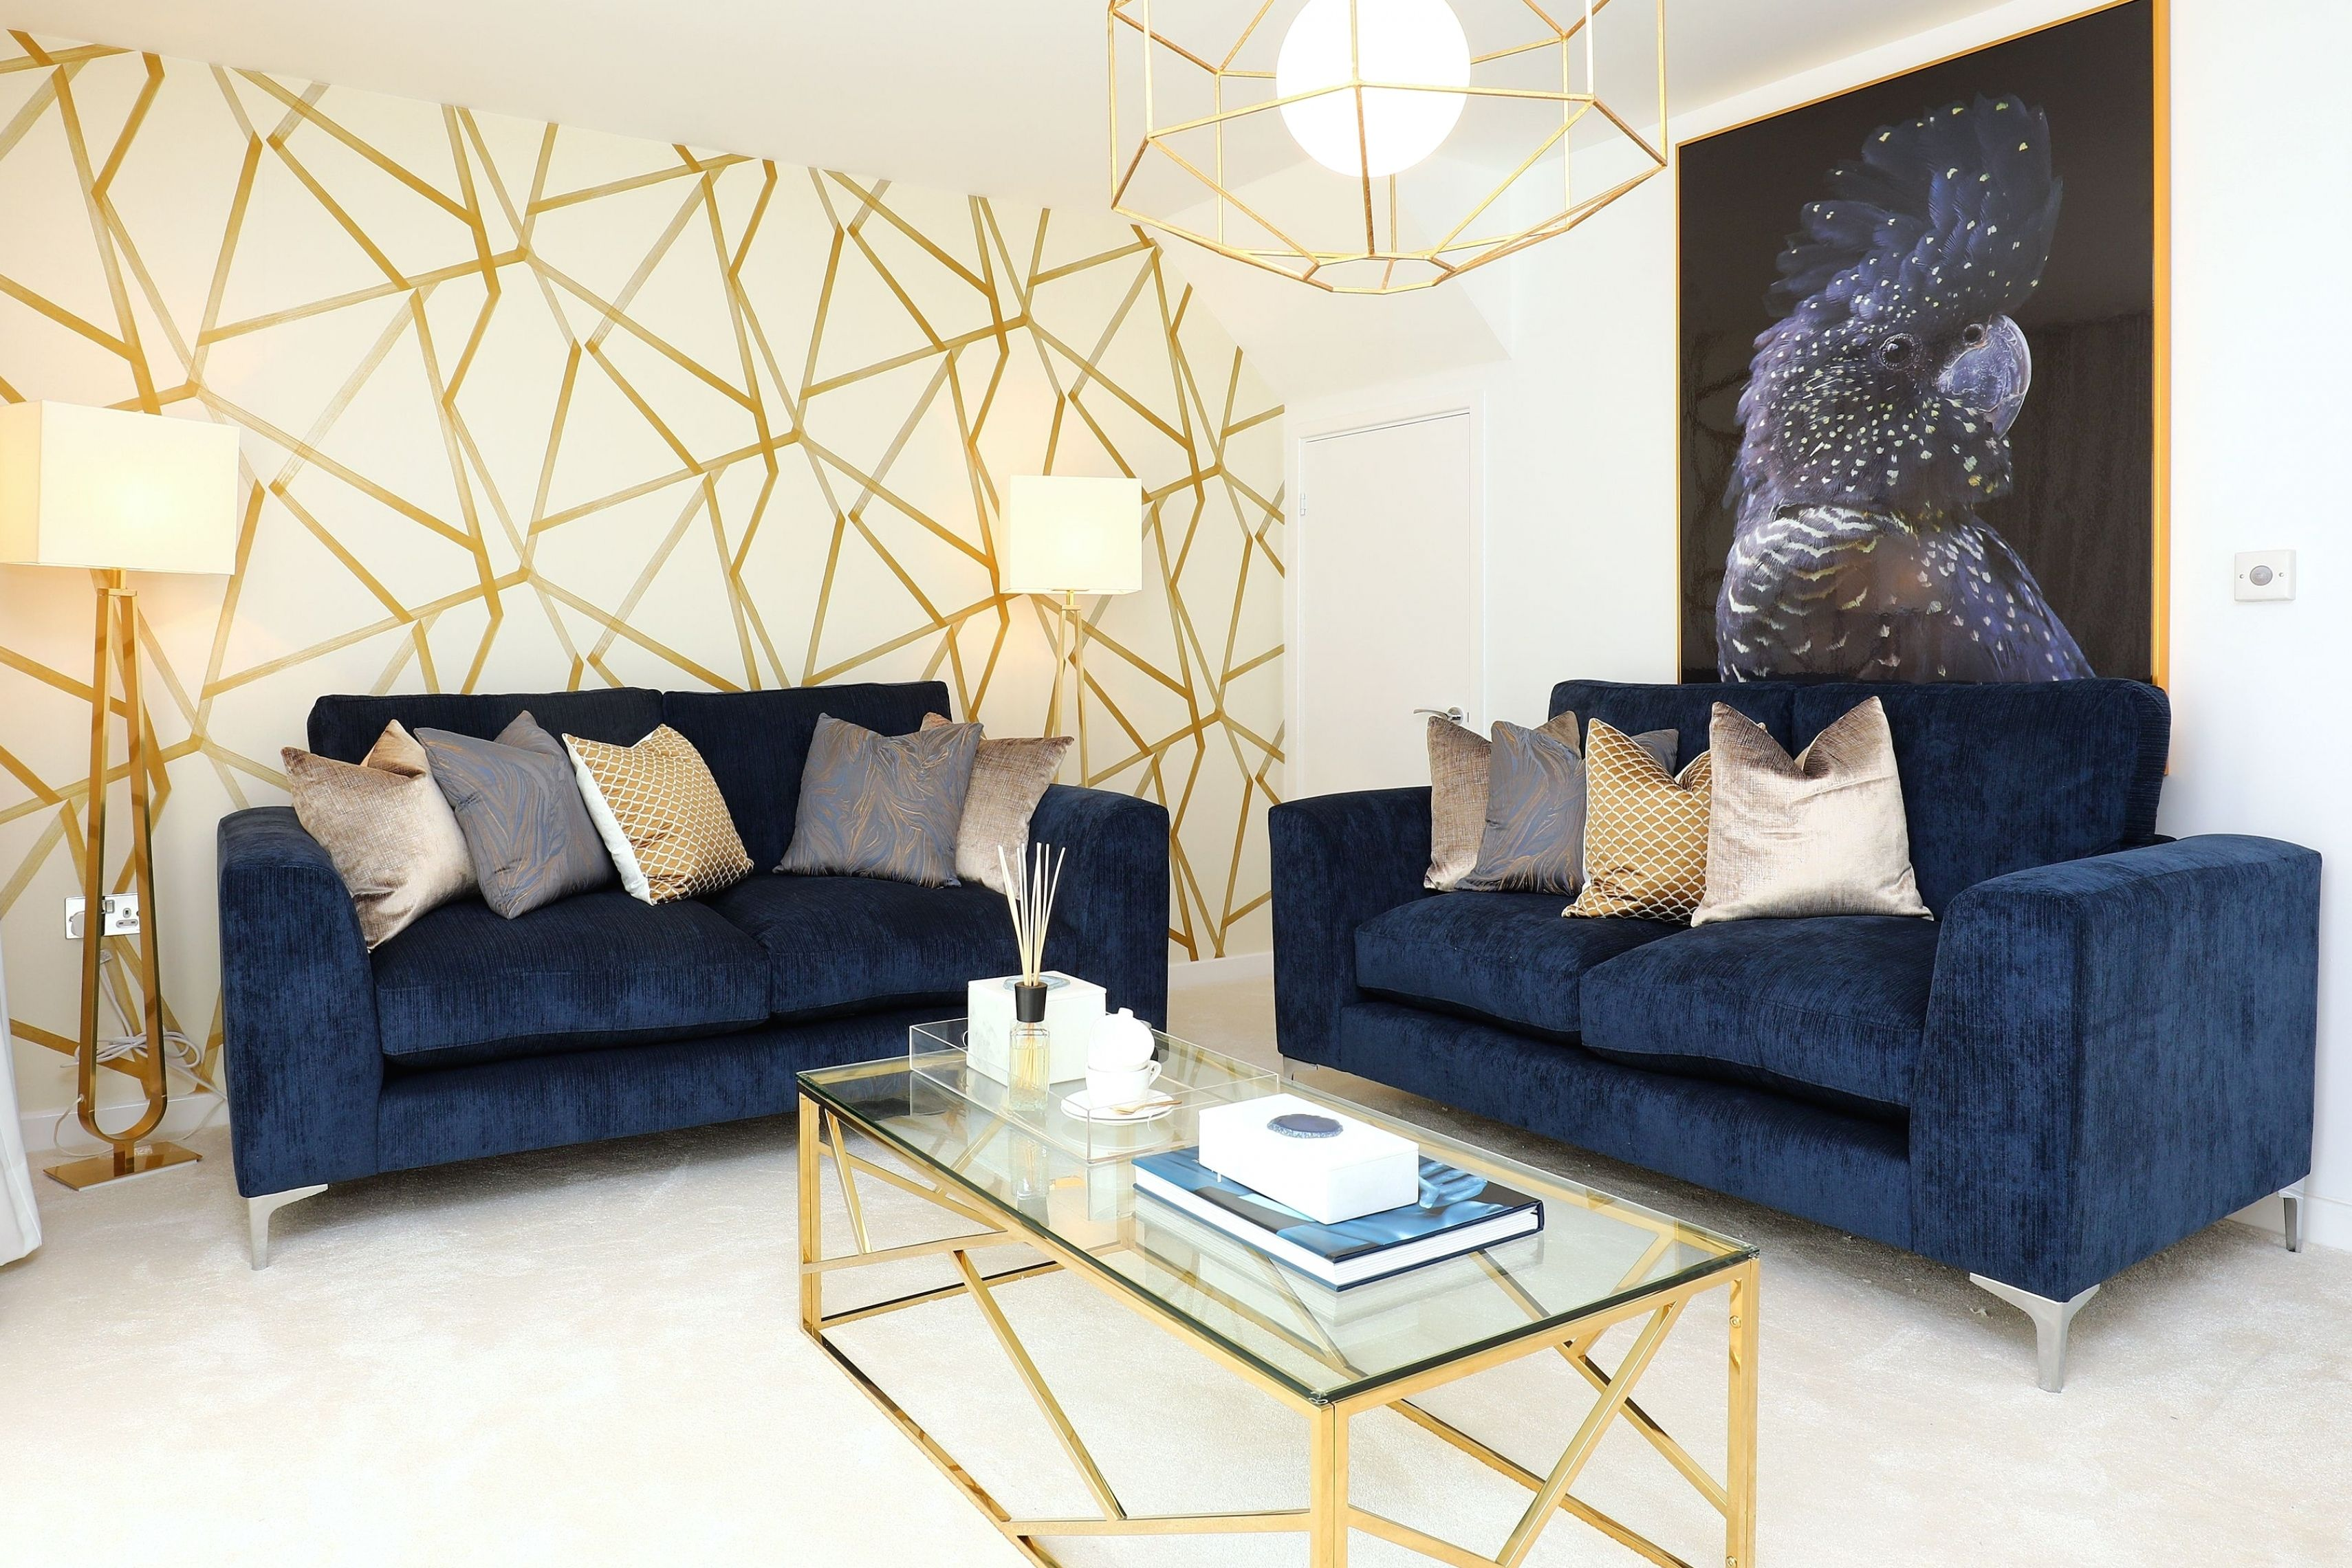 Navy Gold In 2021 Gold Living Room Decor Blue Sofas Living Room Blue Couch Living Room